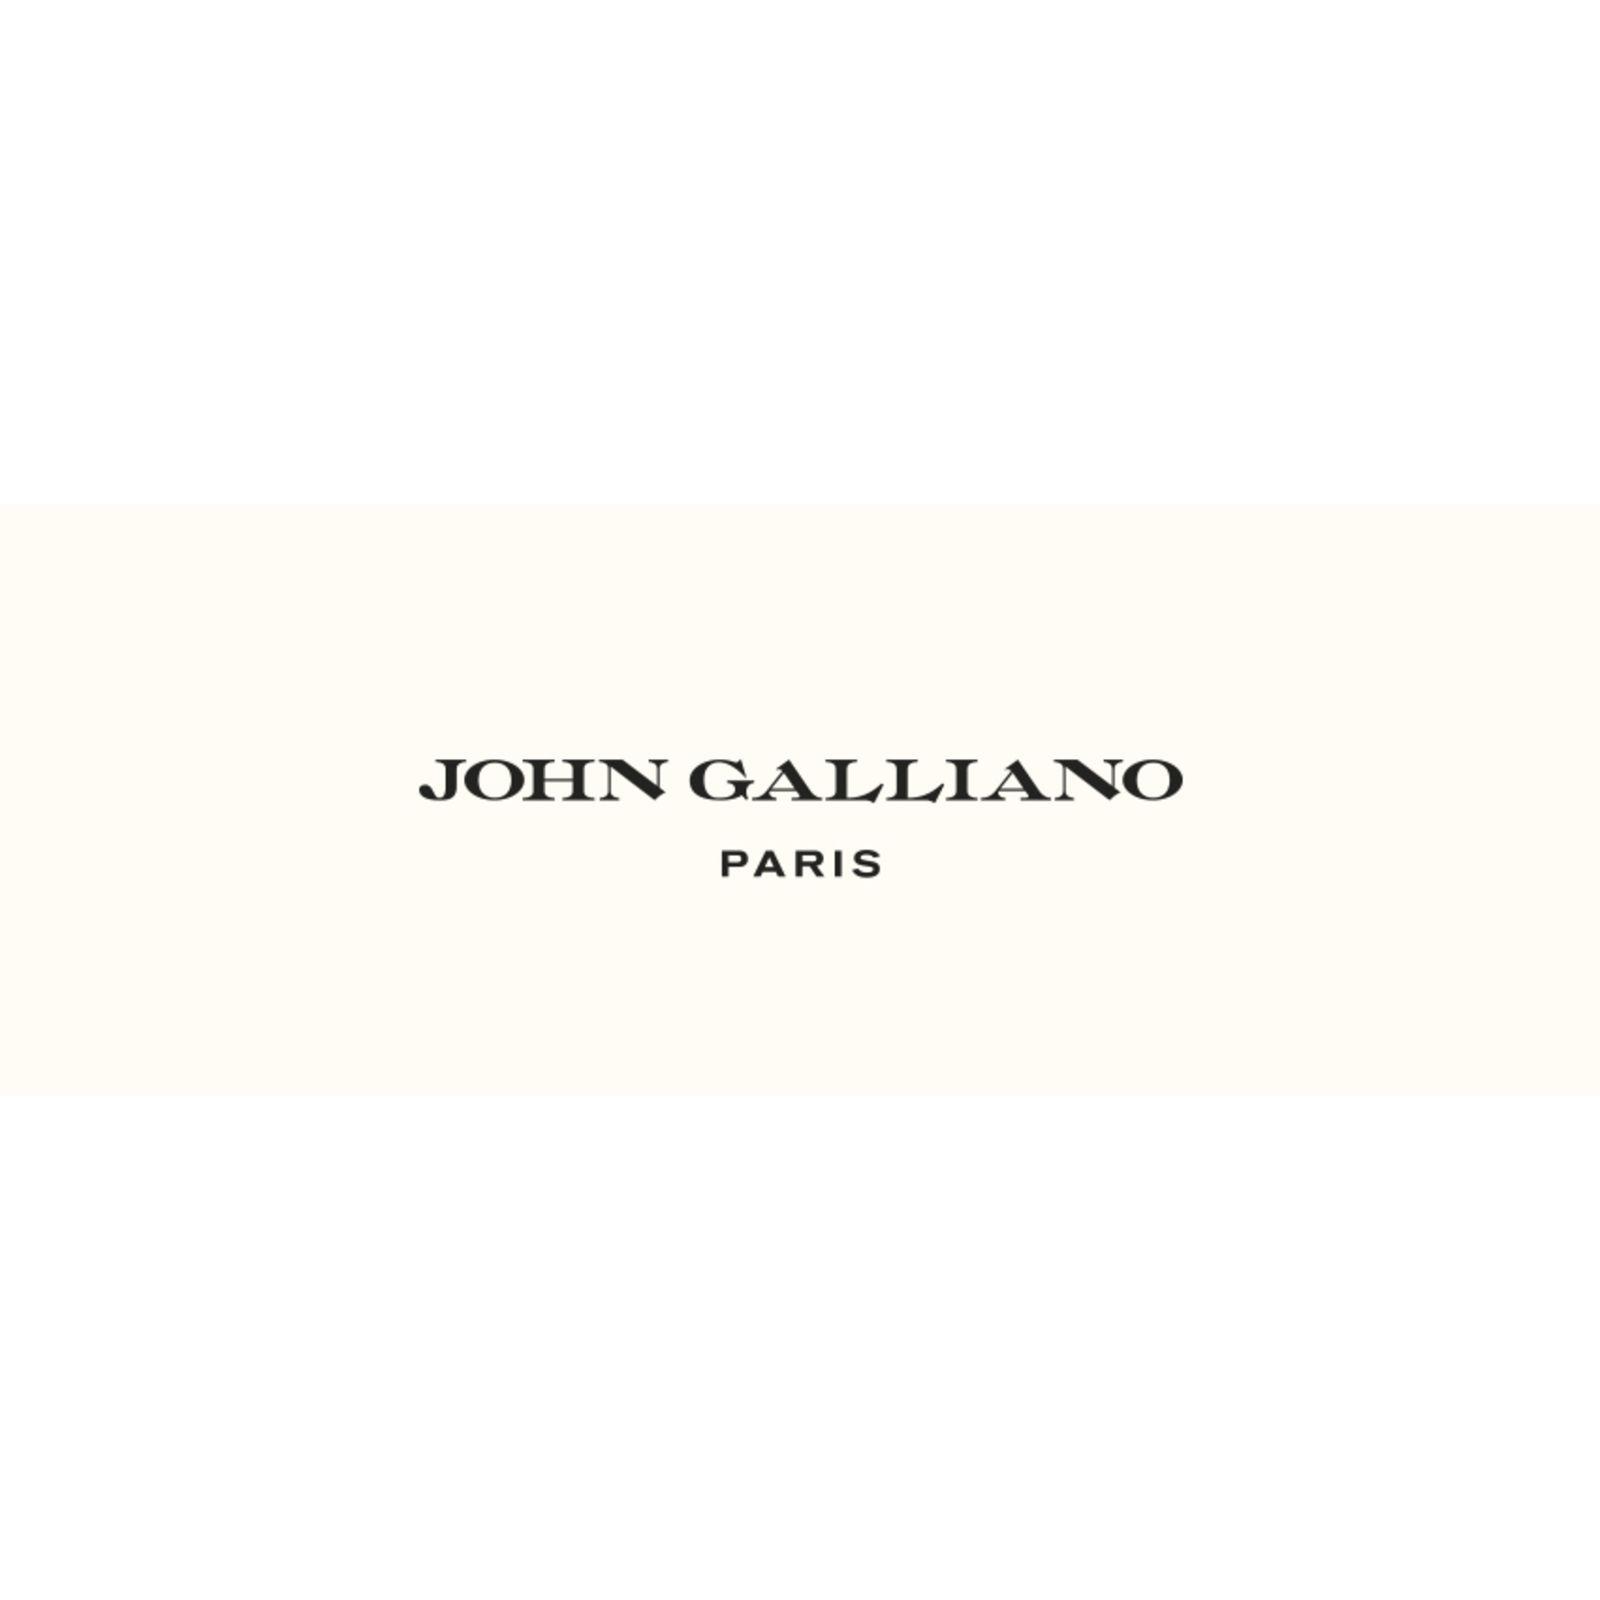 JOHN GALLIANO (Imagen 1)